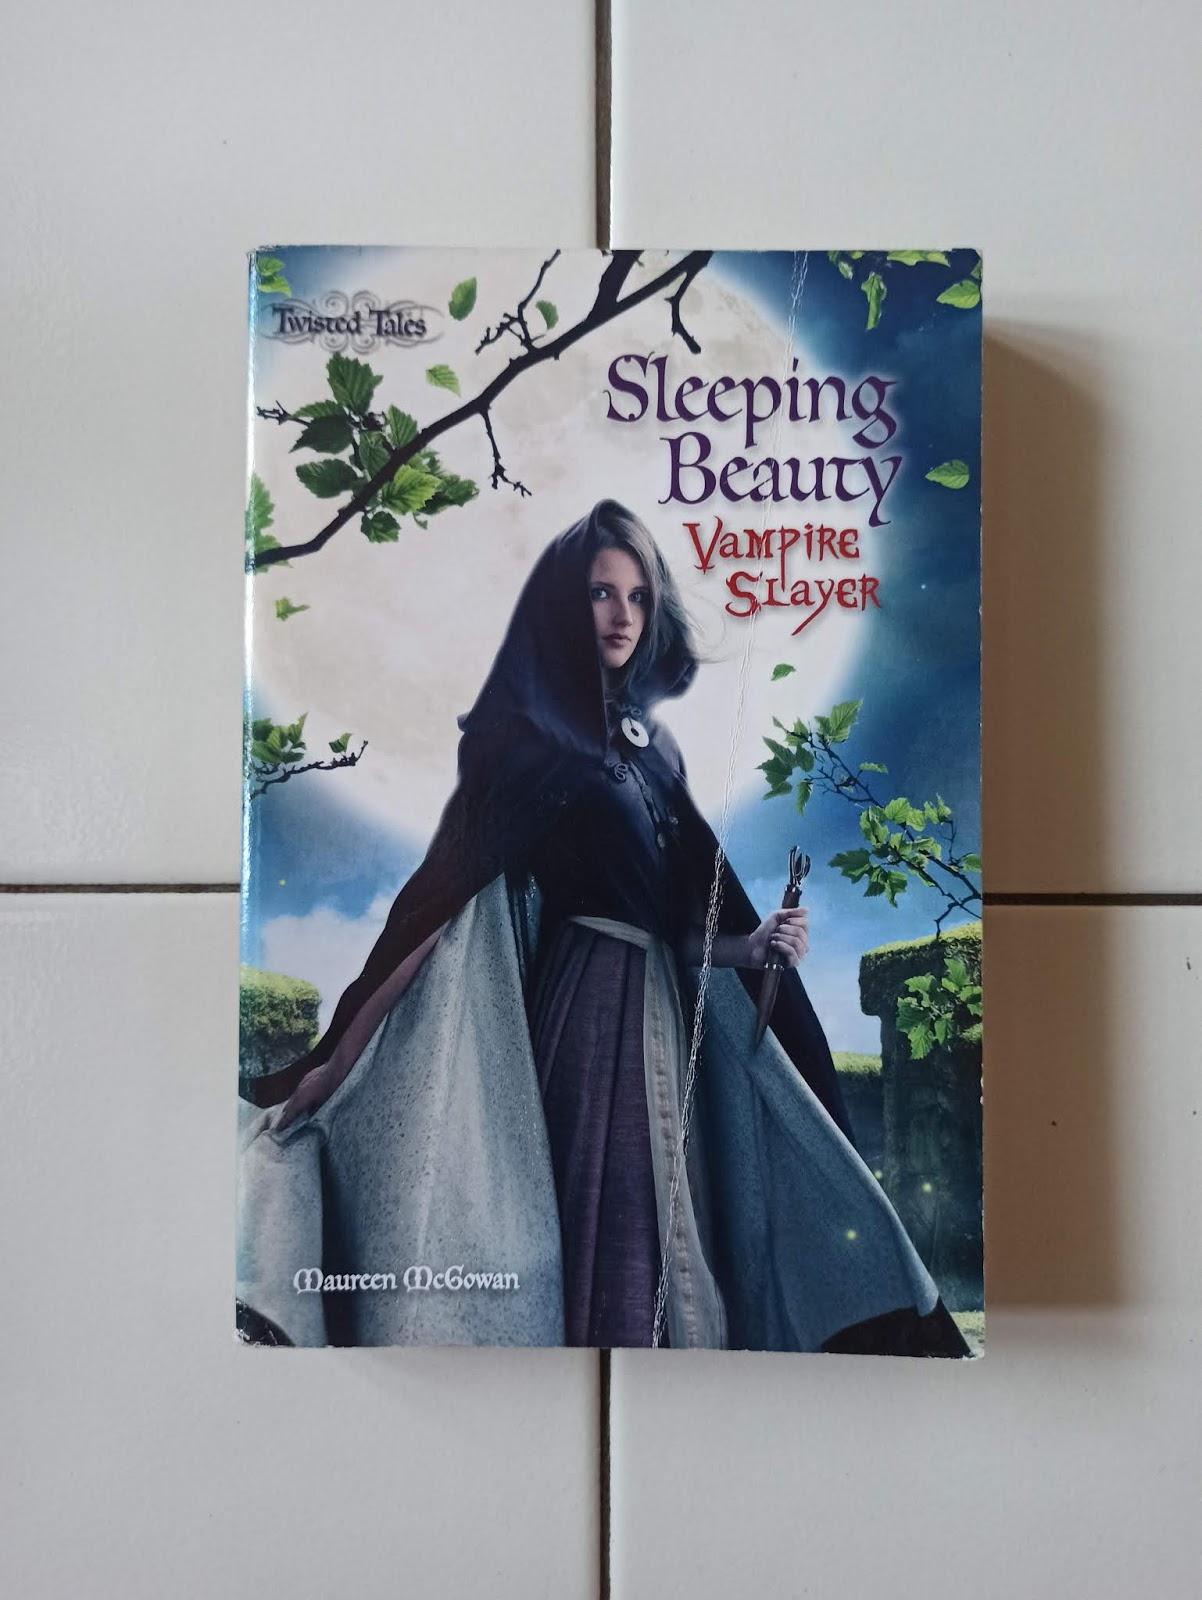 Twisted Tales Sleeping Beauty Vampire